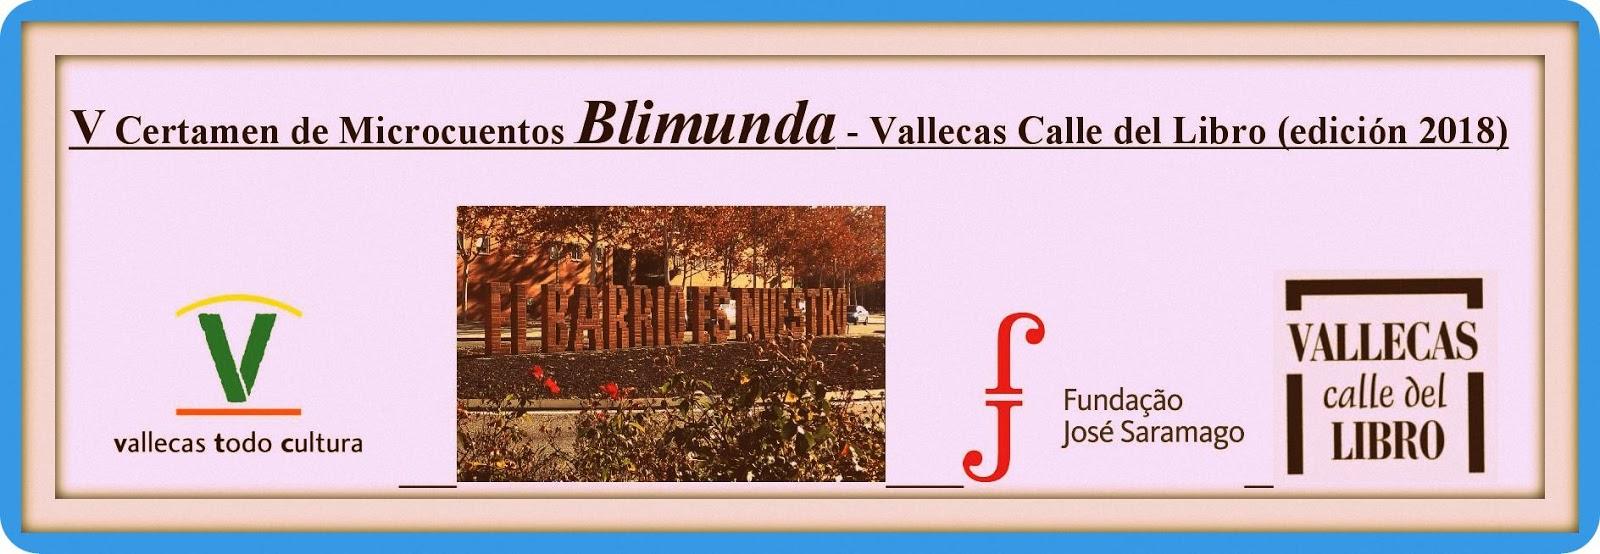 Certamen de Microcuentos Blimunda - Vallecas Calle del Libro (edición 2018)